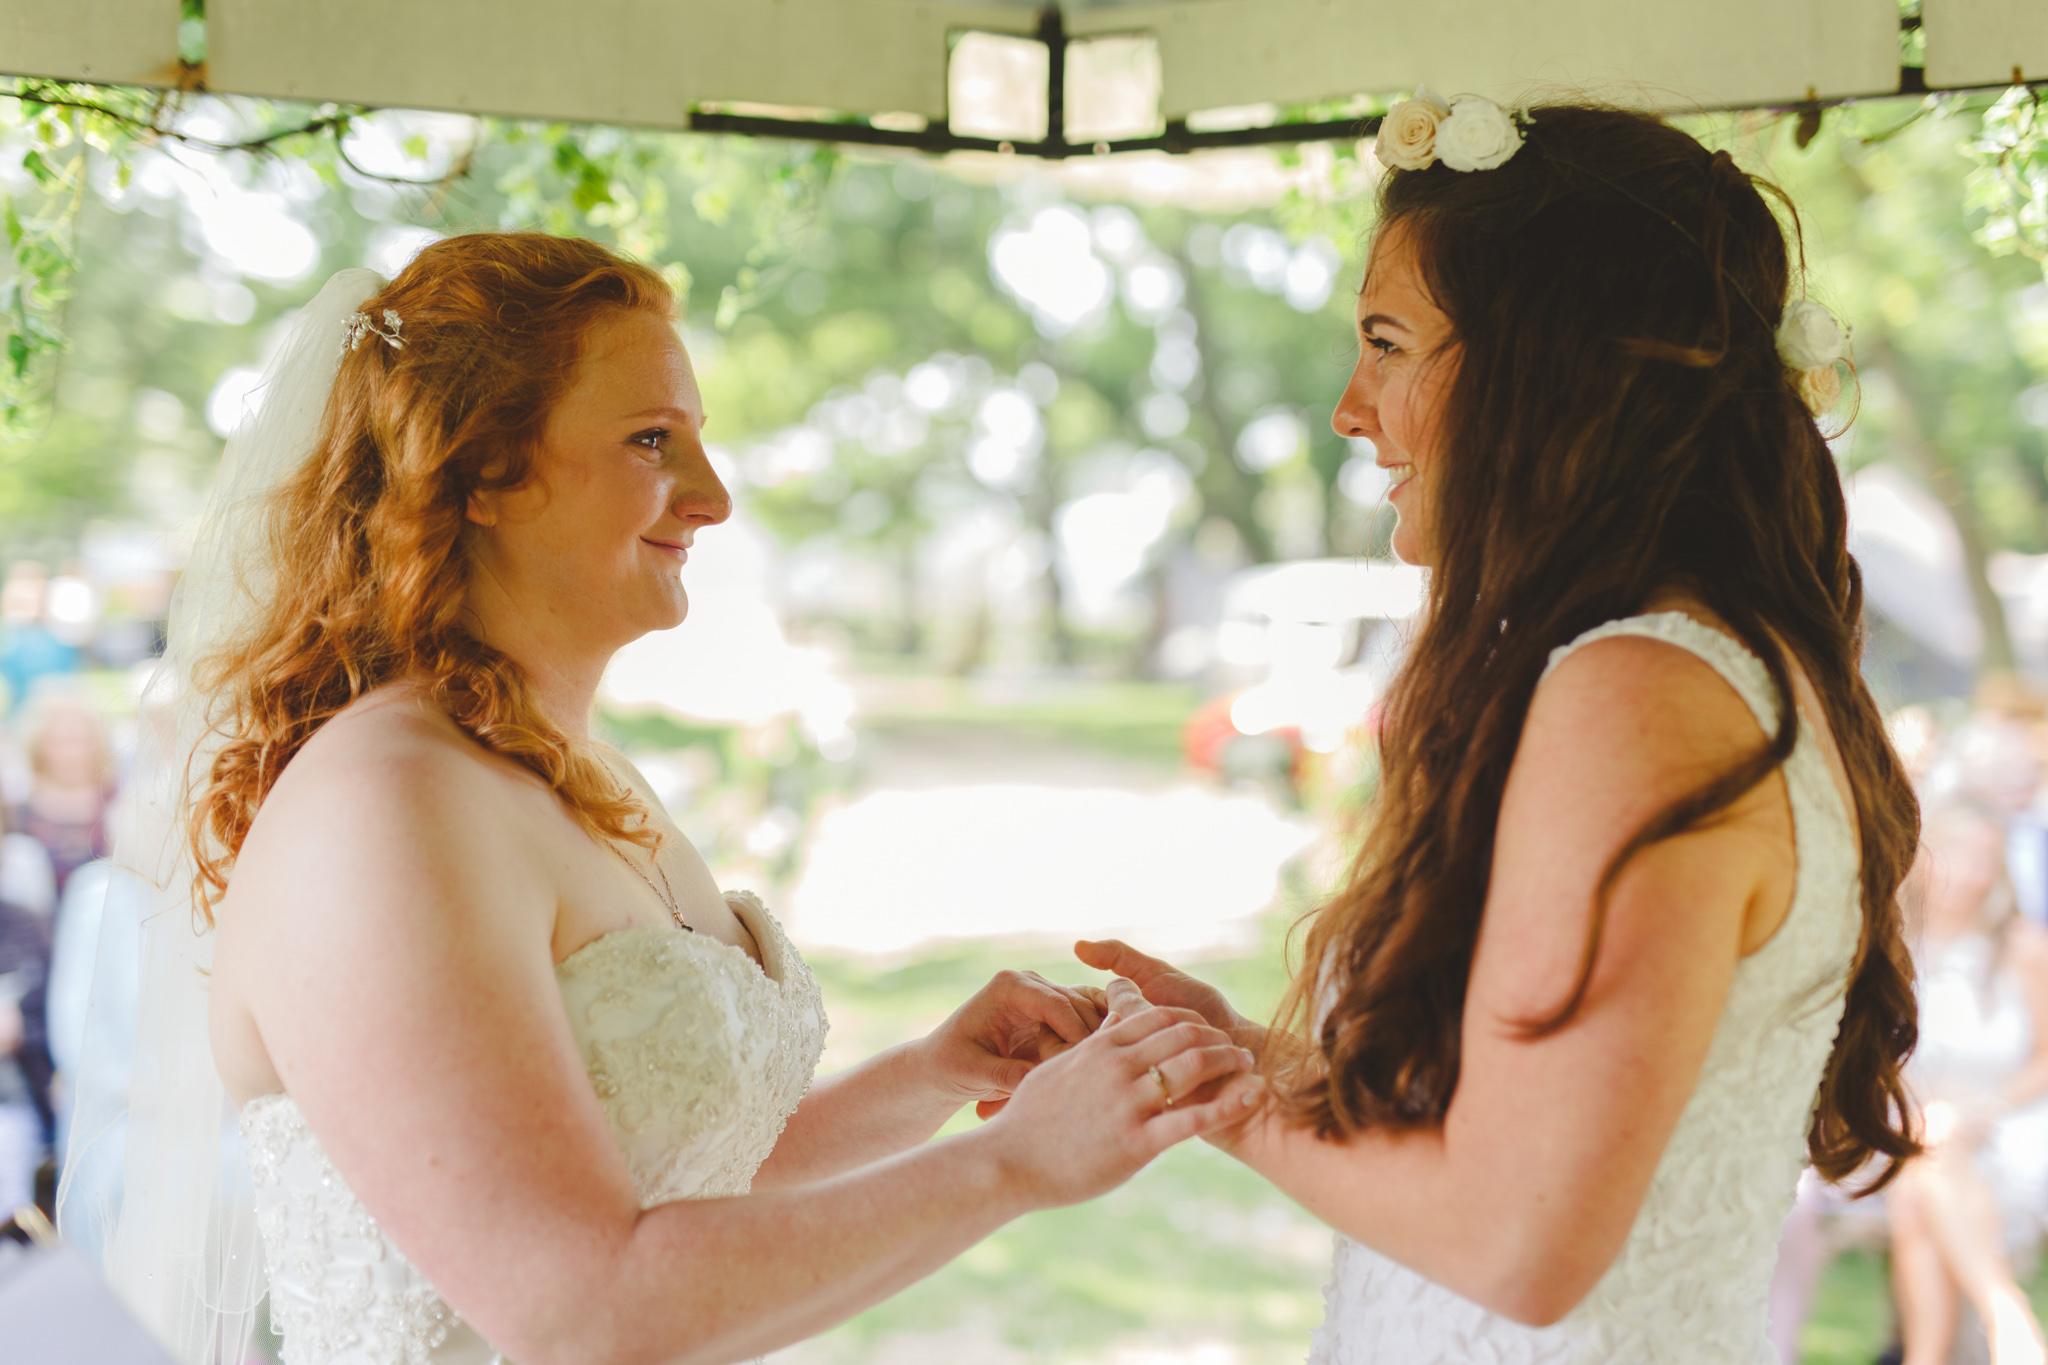 derbyshire-wedding-photographer-videographer-camera-hannah-34.jpg